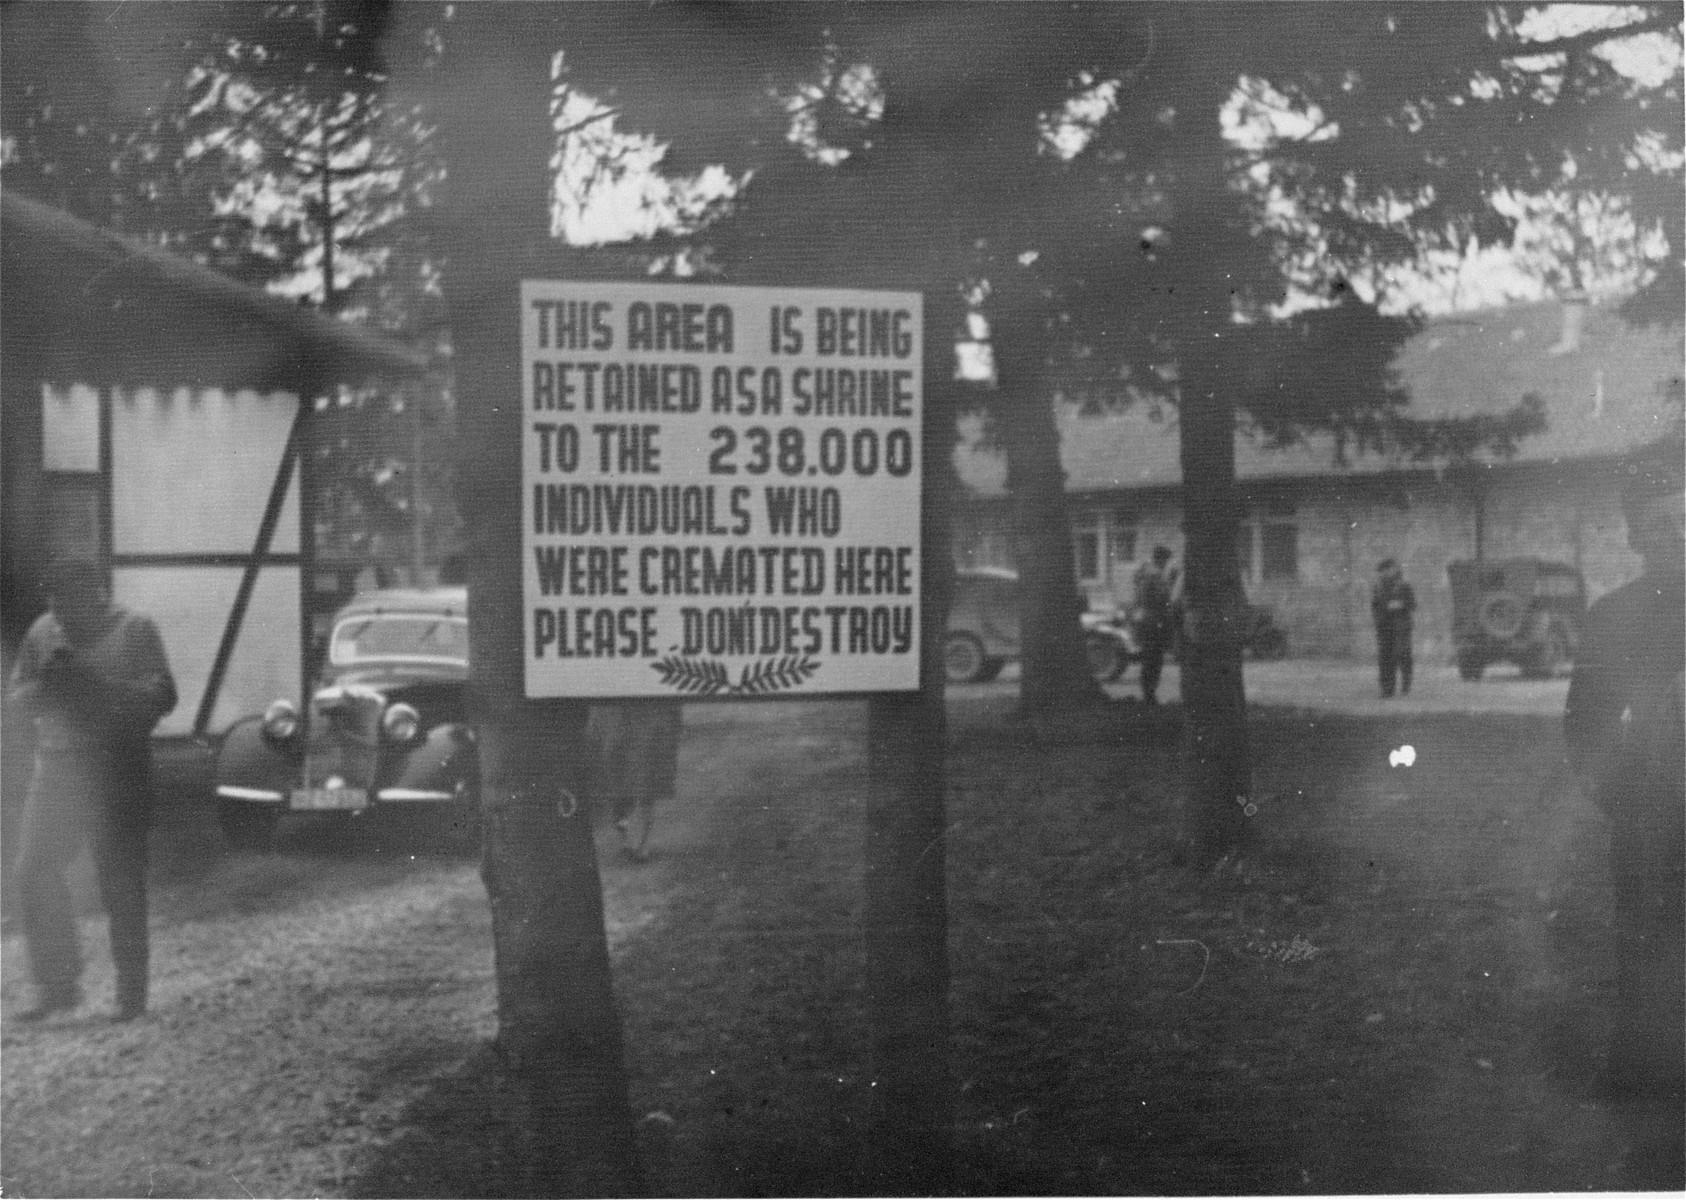 A memorial sign in front of the crematorium in Dachau.